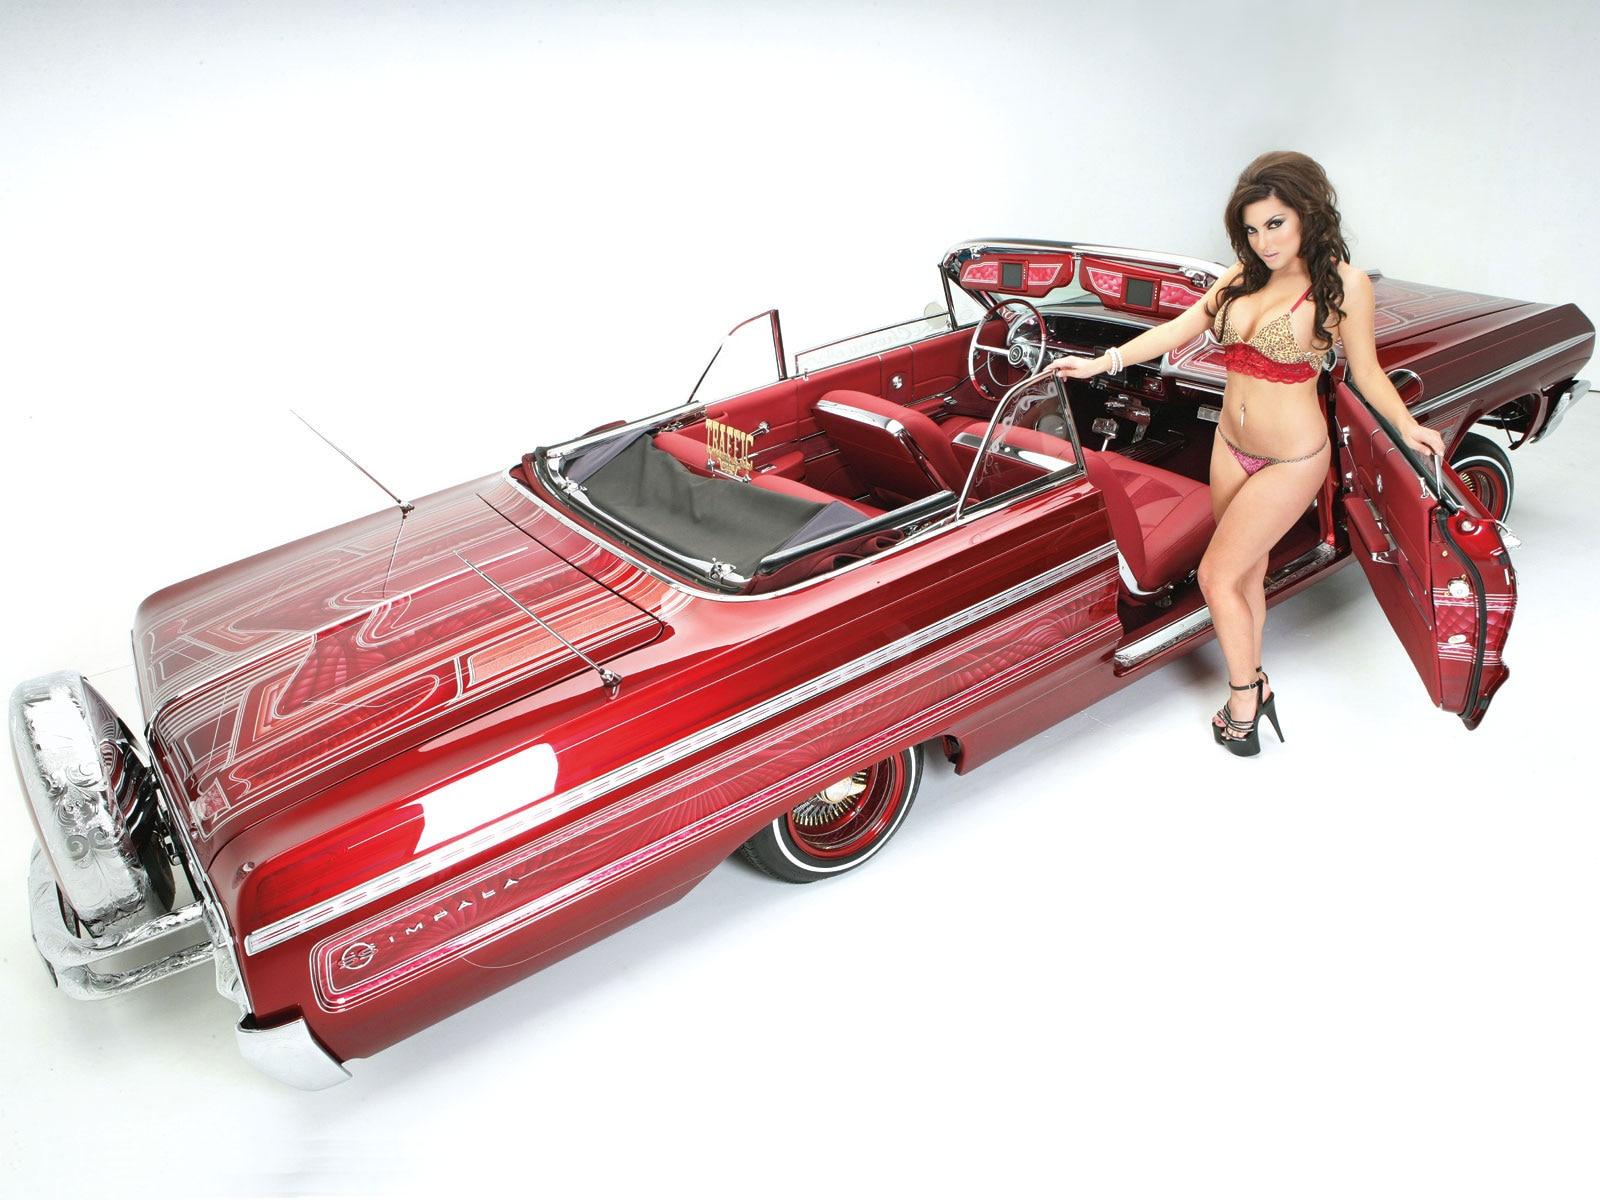 Lrms O Mary Cherry Lowrider Girls Model on 2011 Chevy Impala 3 5